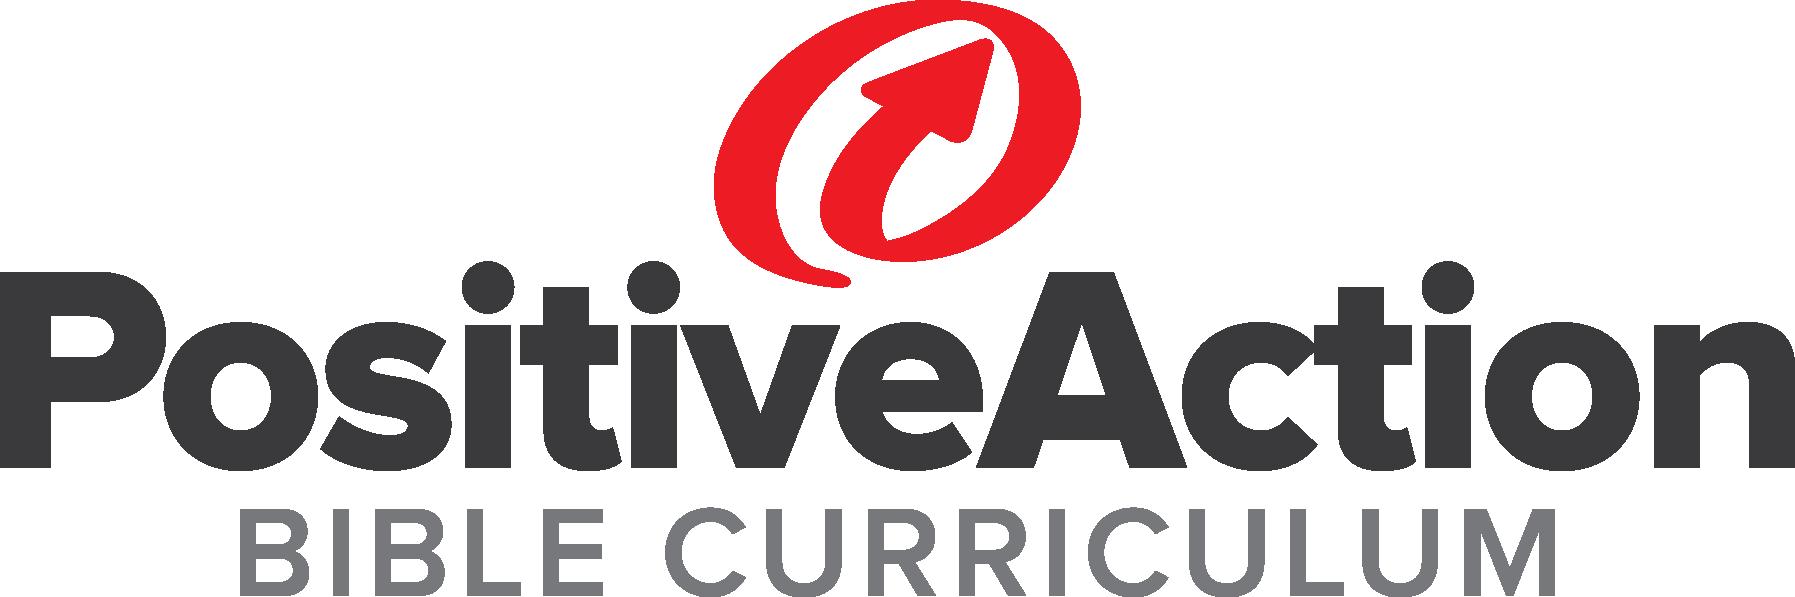 Positive Action Bible Curriculum